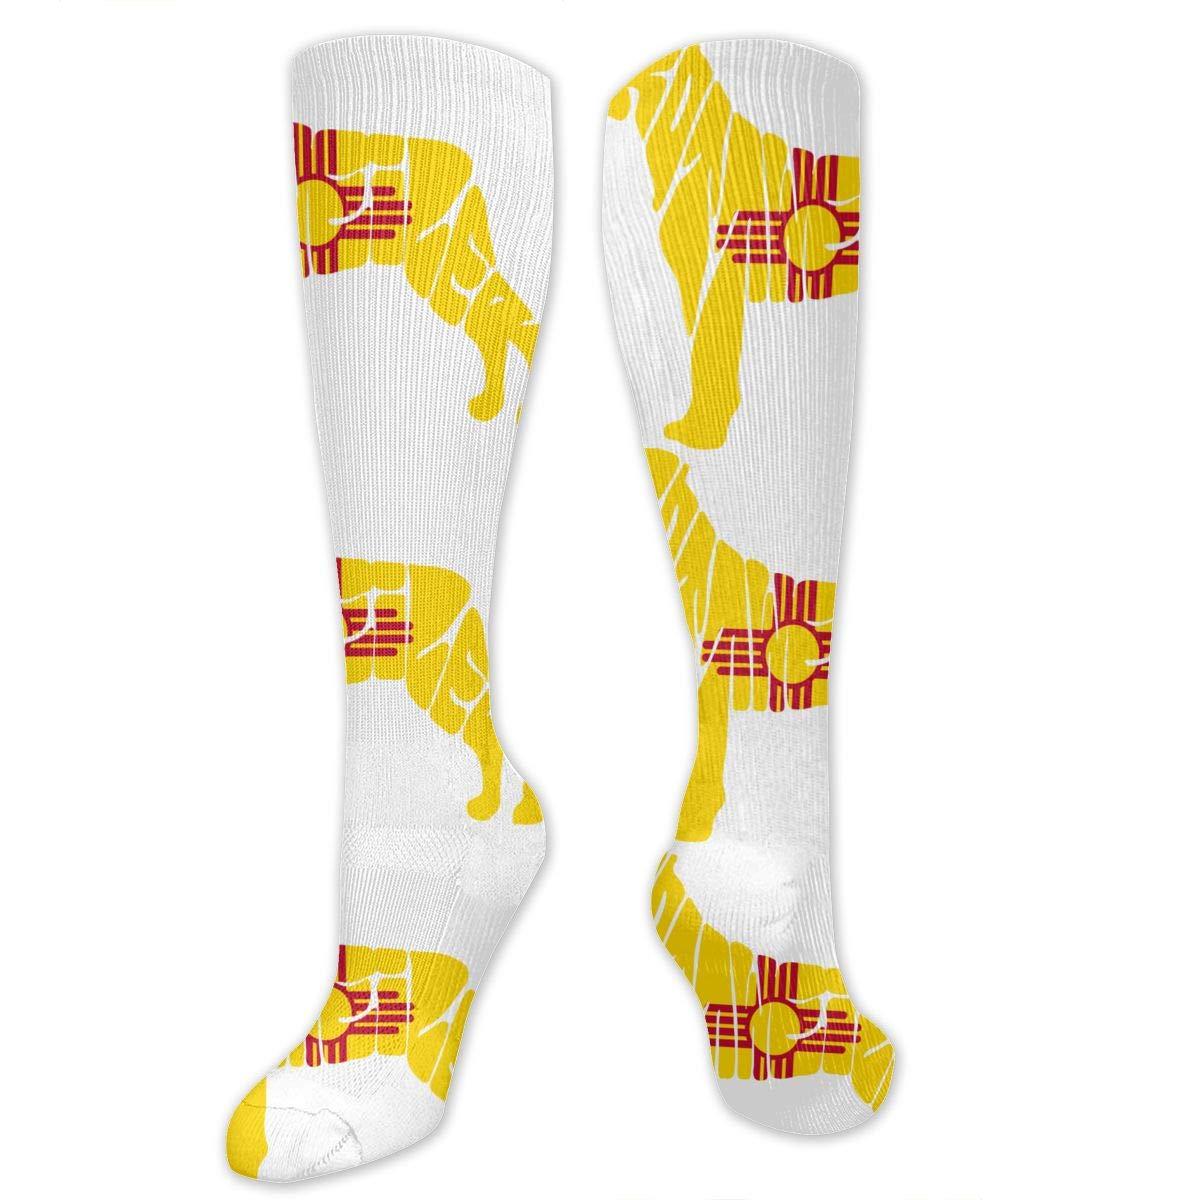 Unisex New Mexico Flag Rottweiler Dog Knee High Compression Thigh High Socks Tube Socks